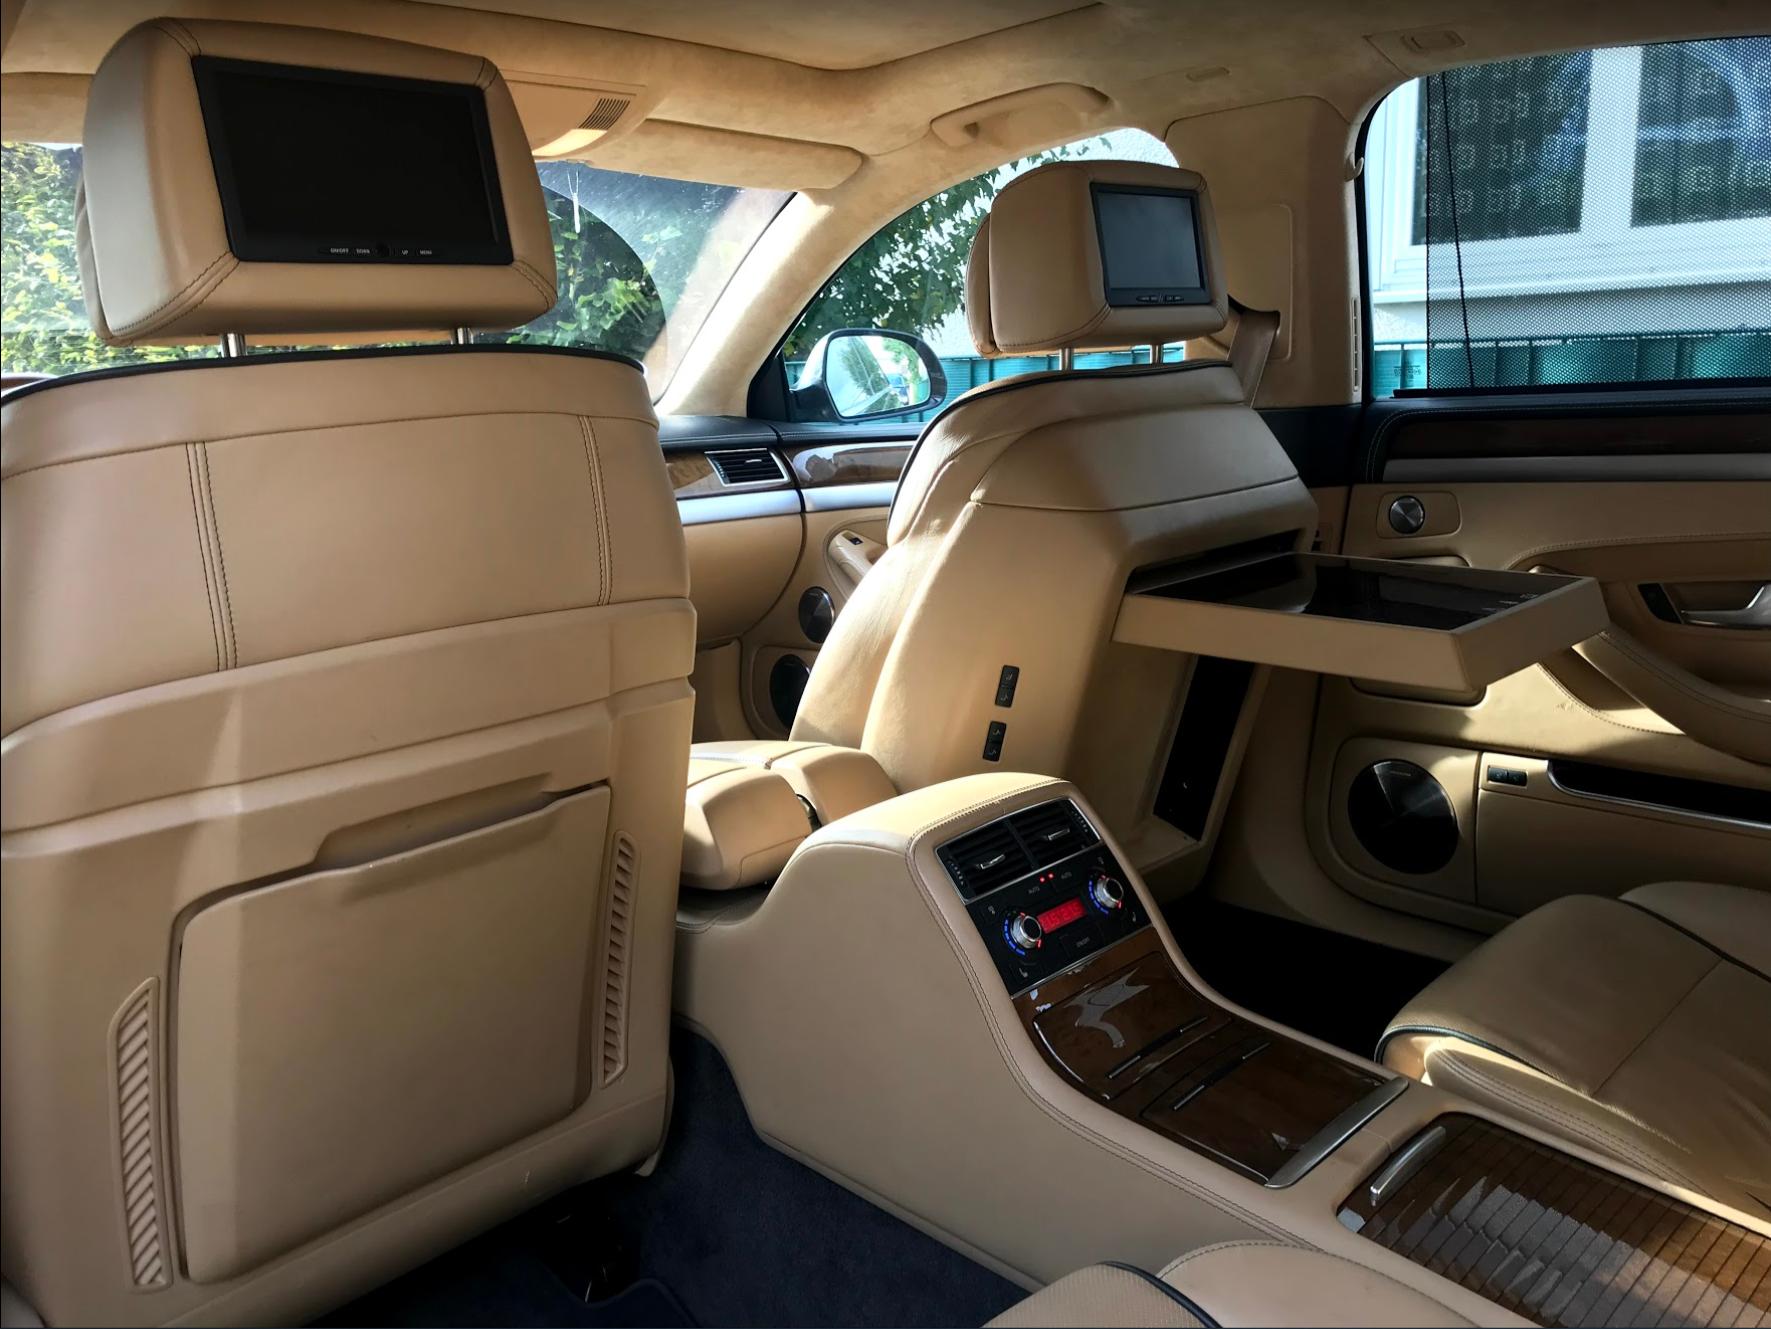 audi-a8-rear-seat-entertainment.PNG